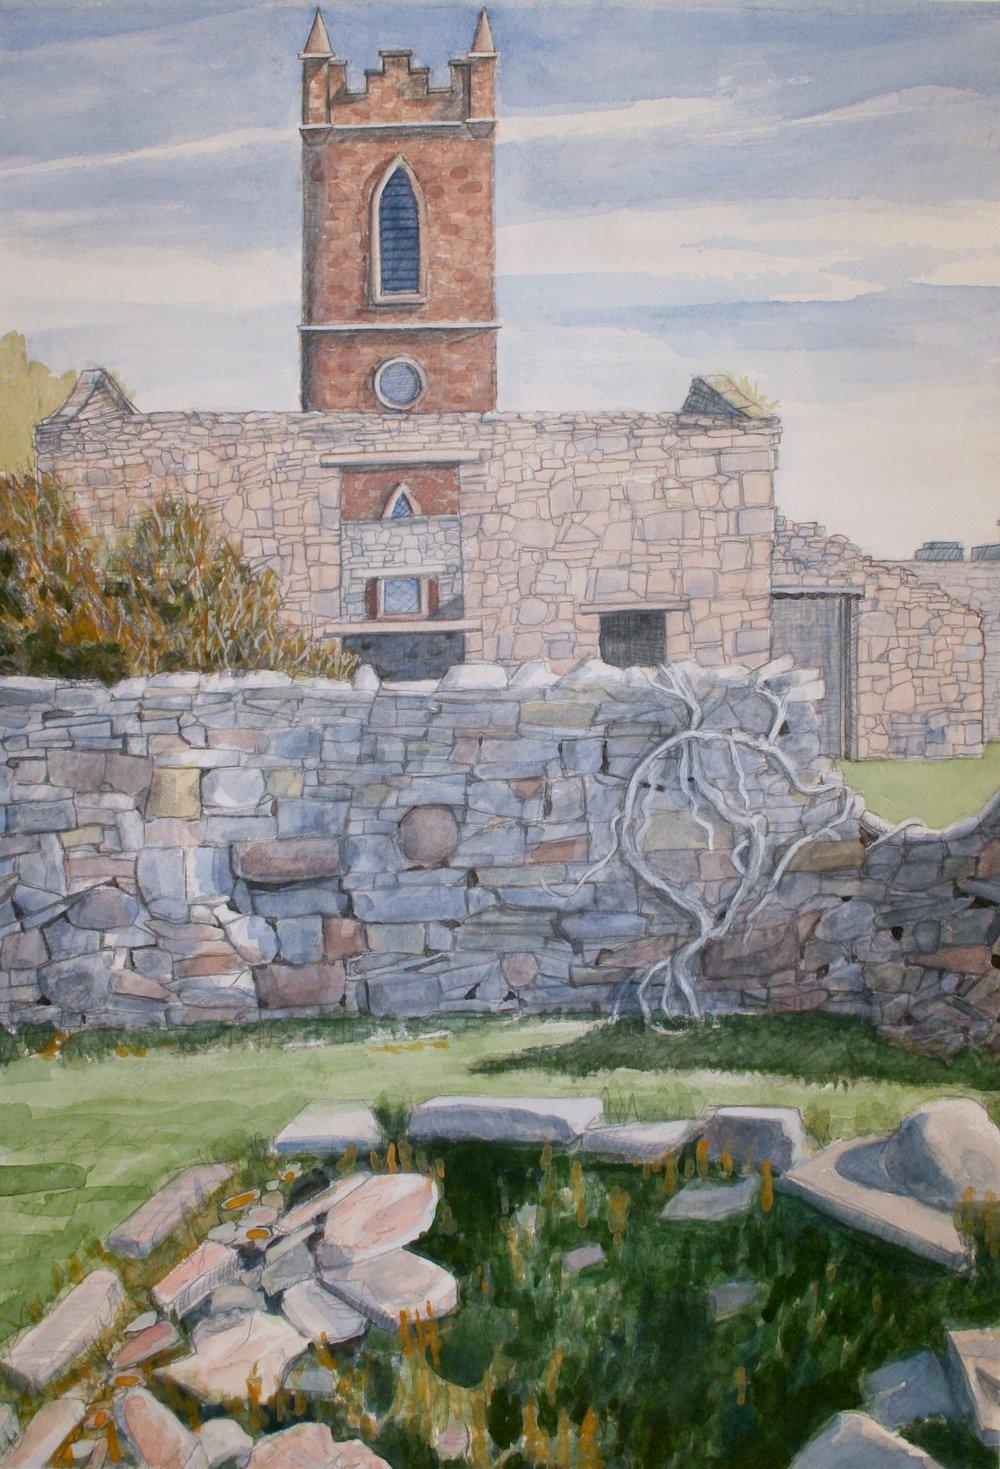 "Church Next Door, Ballycastle   Watercolor/pencil, 20x14"", 2013"